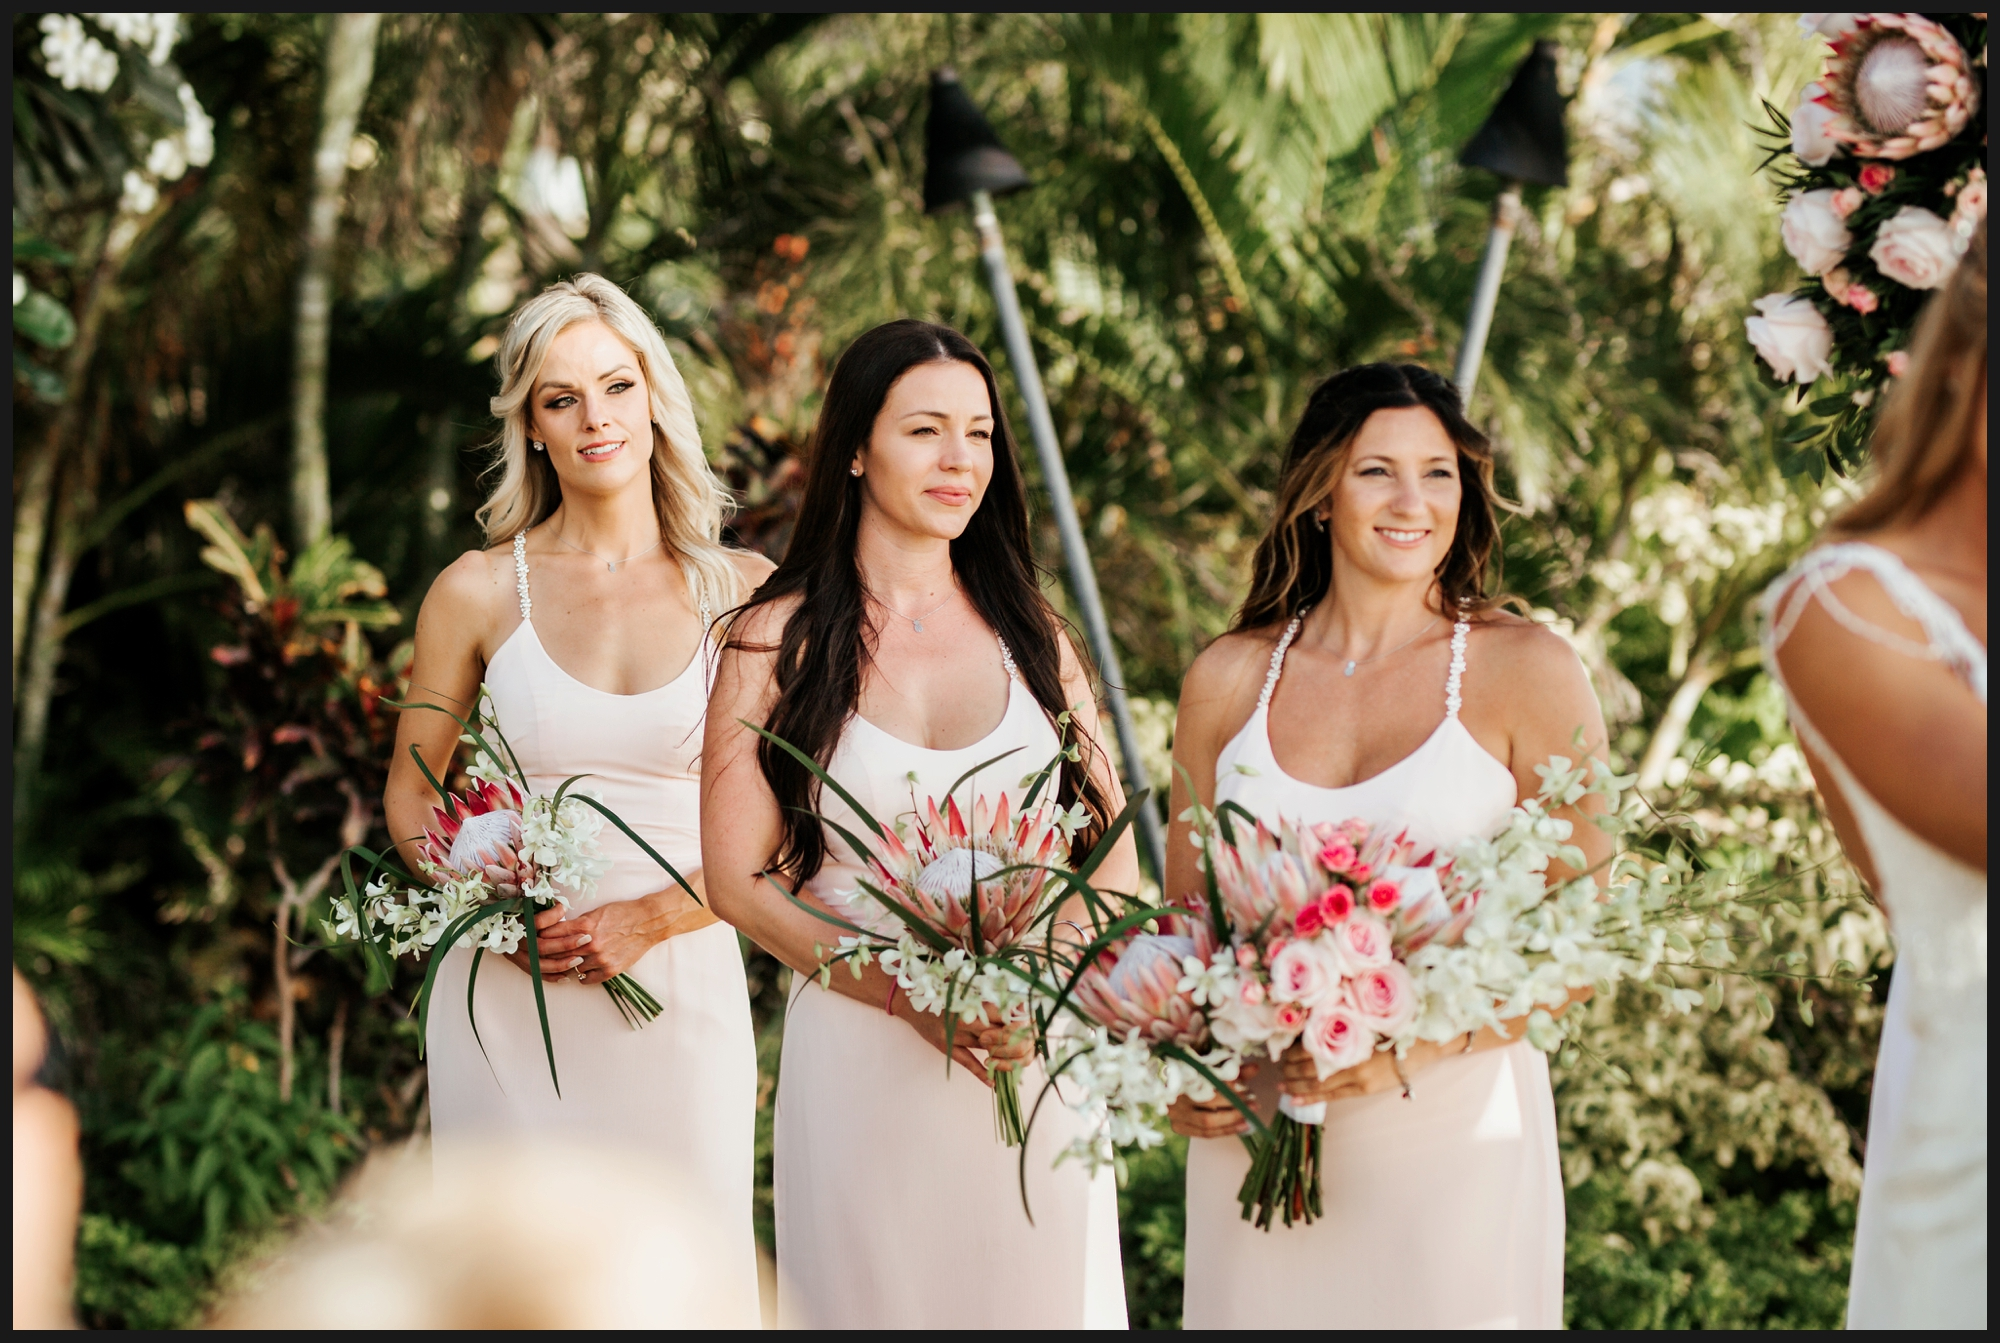 Orlando-Wedding-Photographer-destination-wedding-photographer-florida-wedding-photographer-hawaii-wedding-photographer_0057.jpg